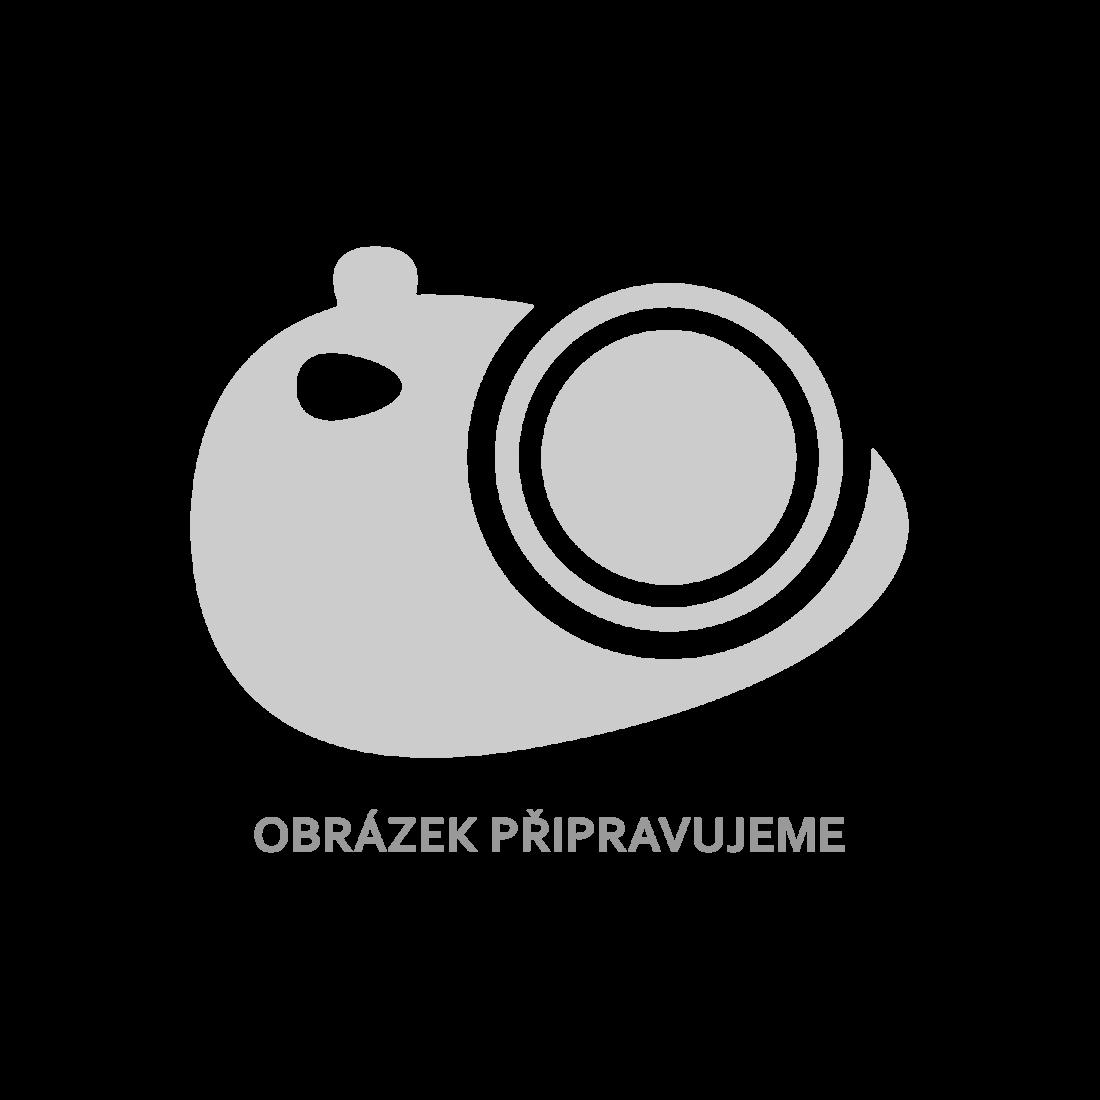 vidaXL Nástěnné TV skříňky 2 ks bílé a dub sonoma 30,5 x 30 x 30 cm [804497]